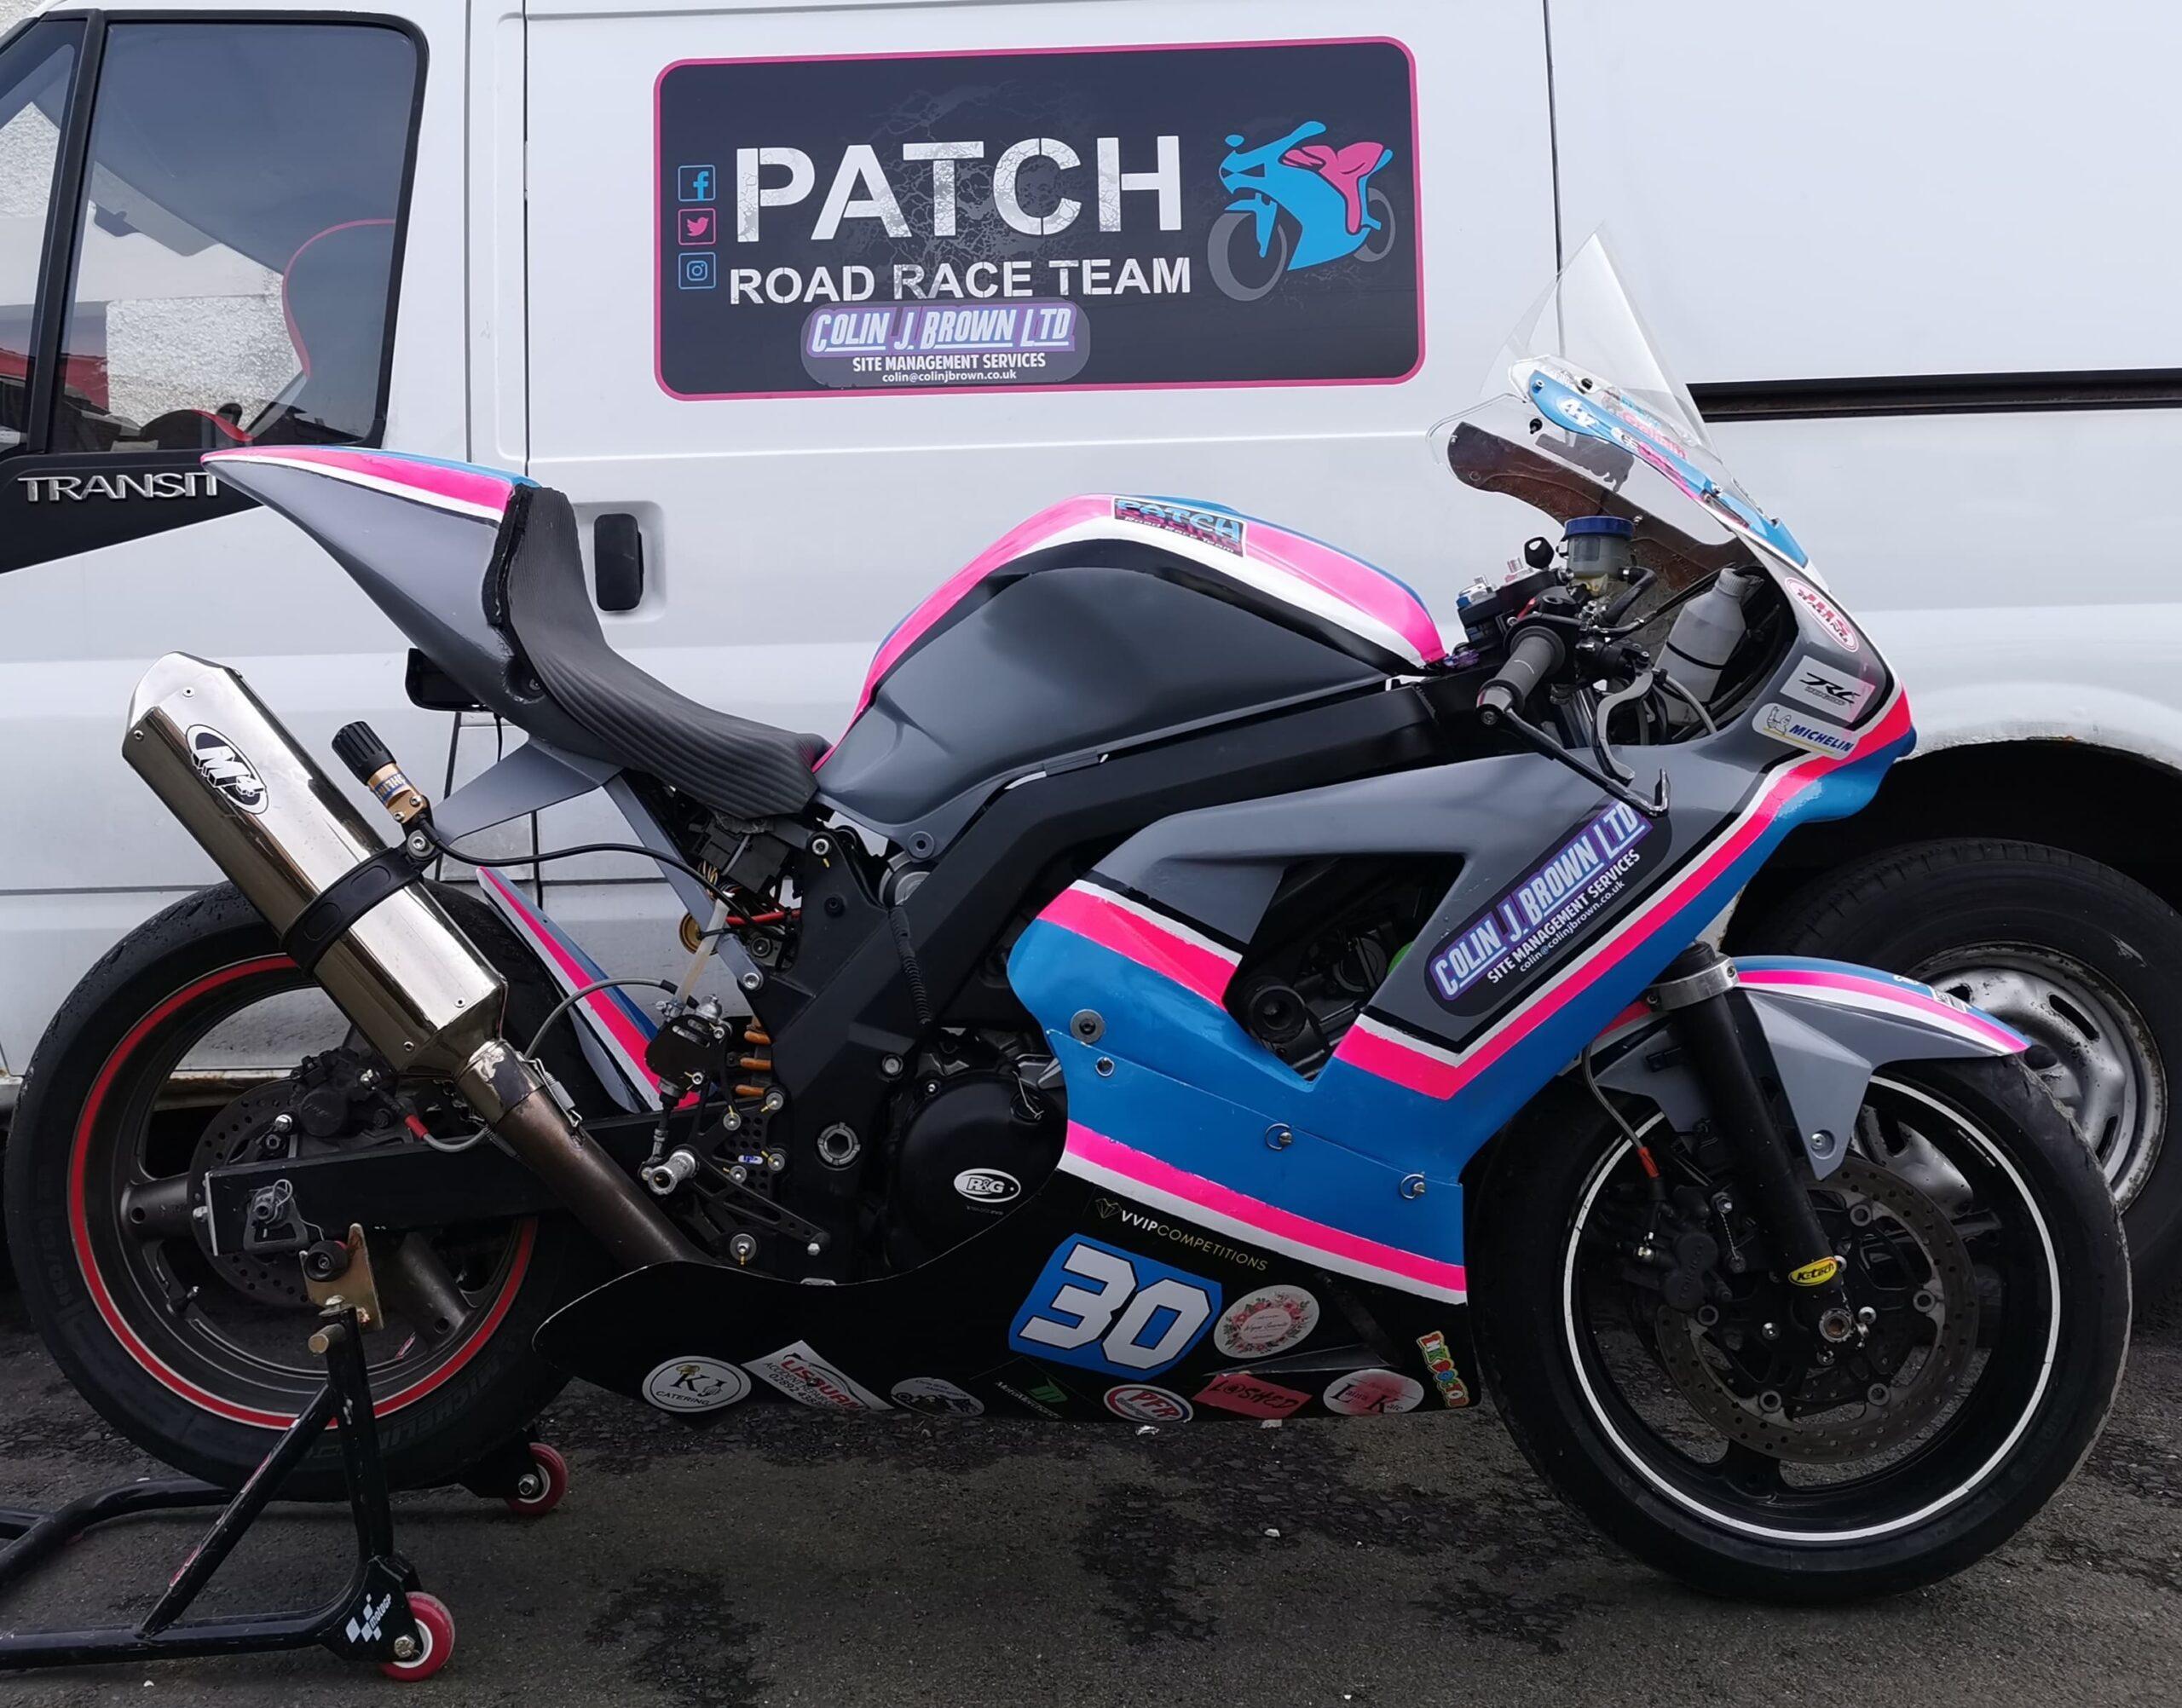 Patch Racing Set Out 2021 Aspirations